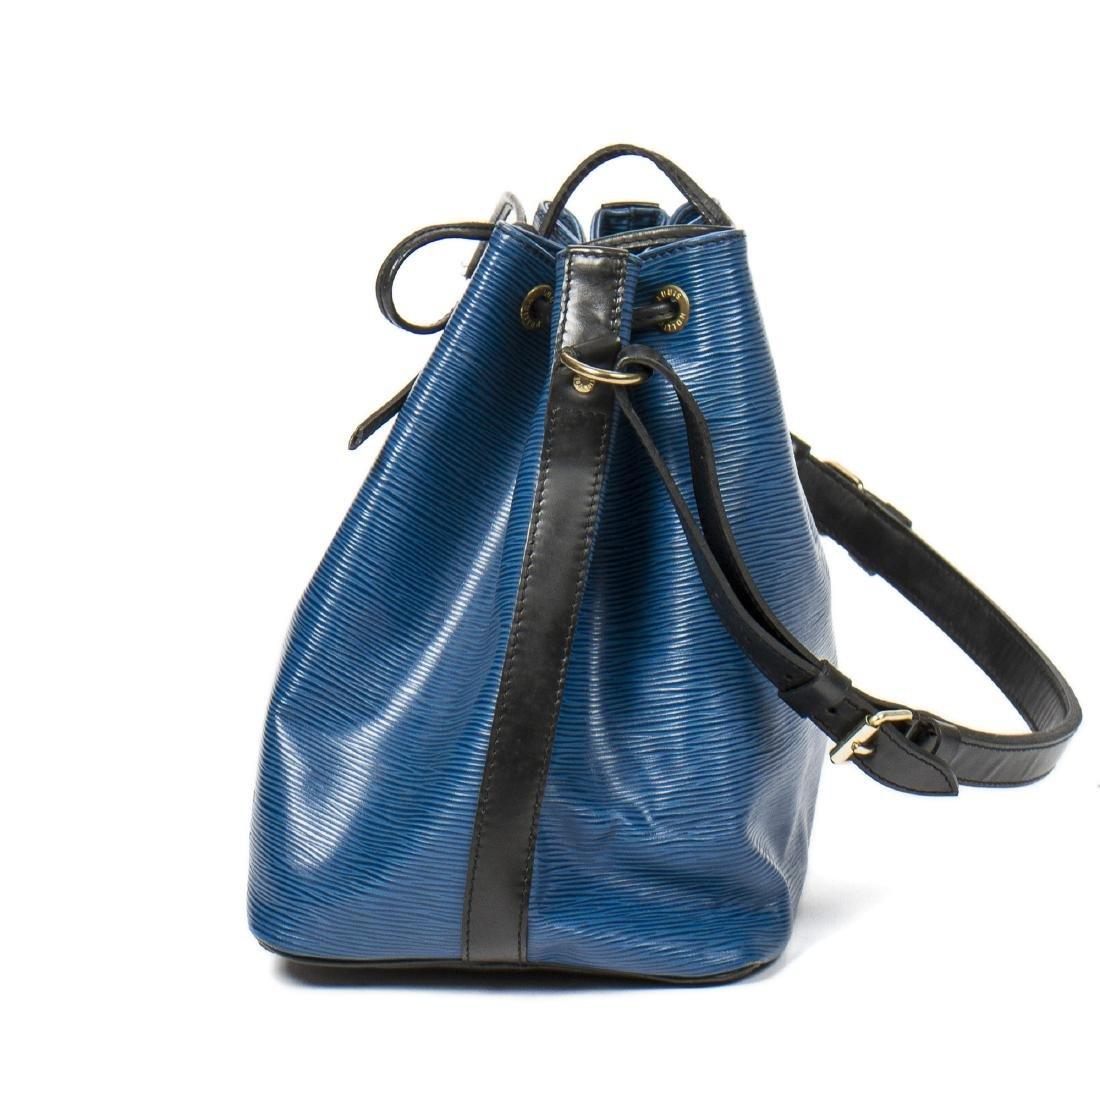 Louis Vuitton Noe Bicolor - 3